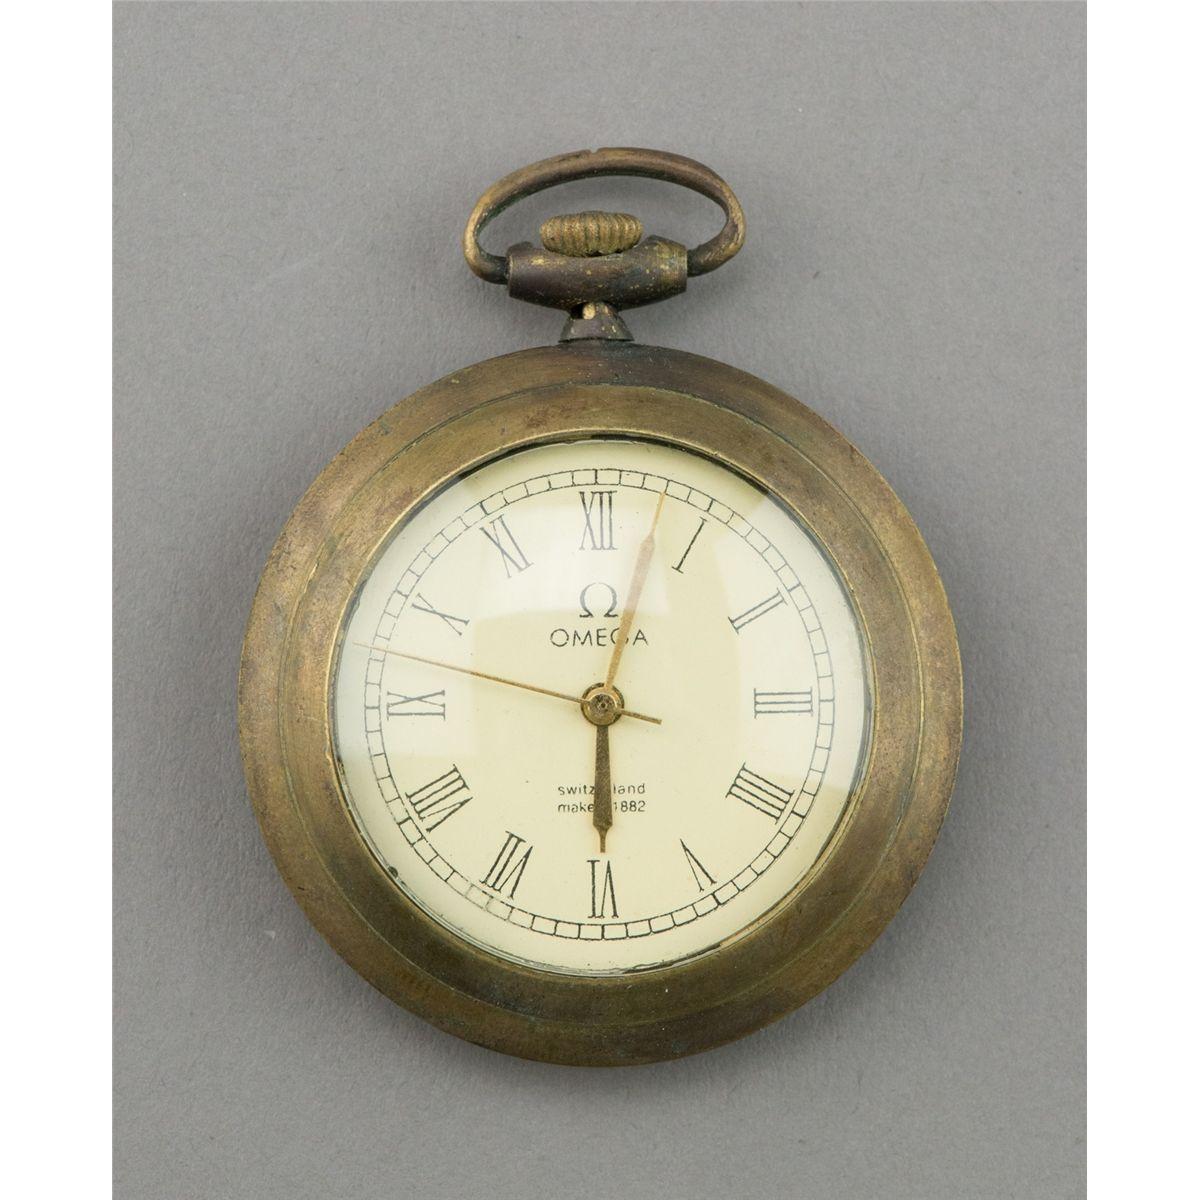 Omega Stop Watch Marked Switzerland 1882